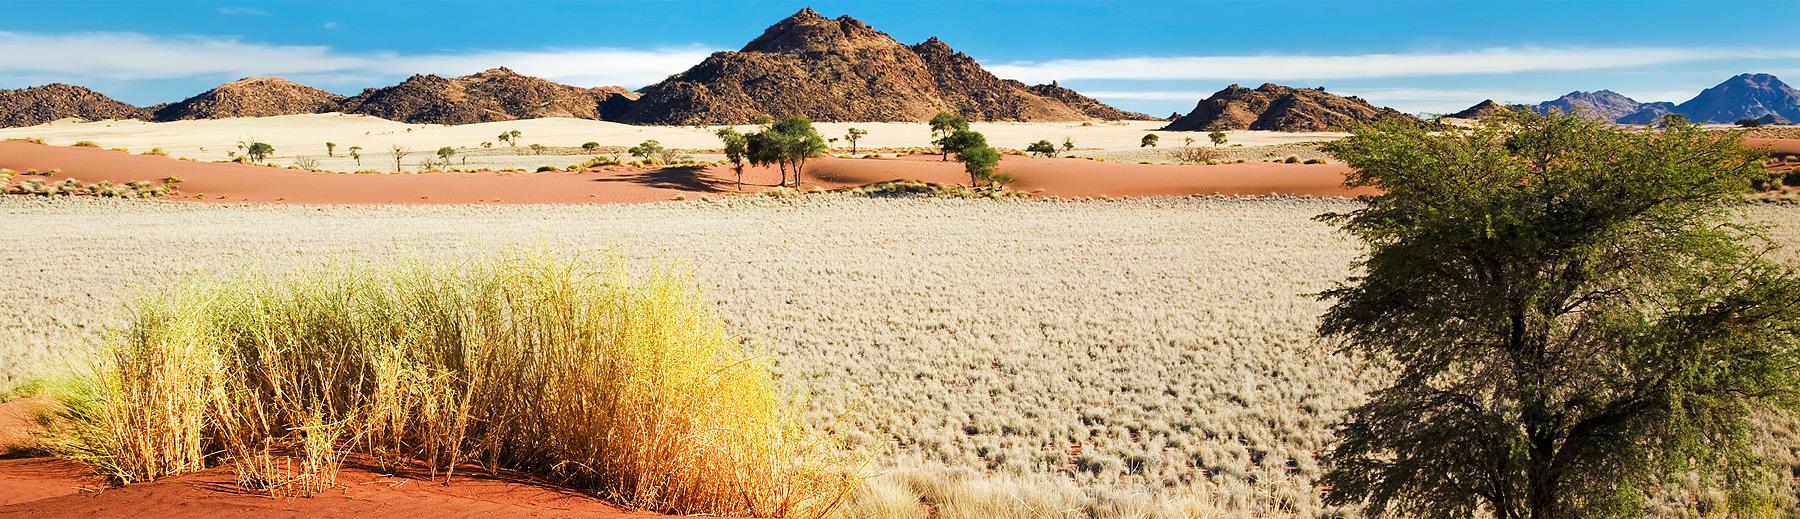 A beautiful scene of the Namib Naukluft park